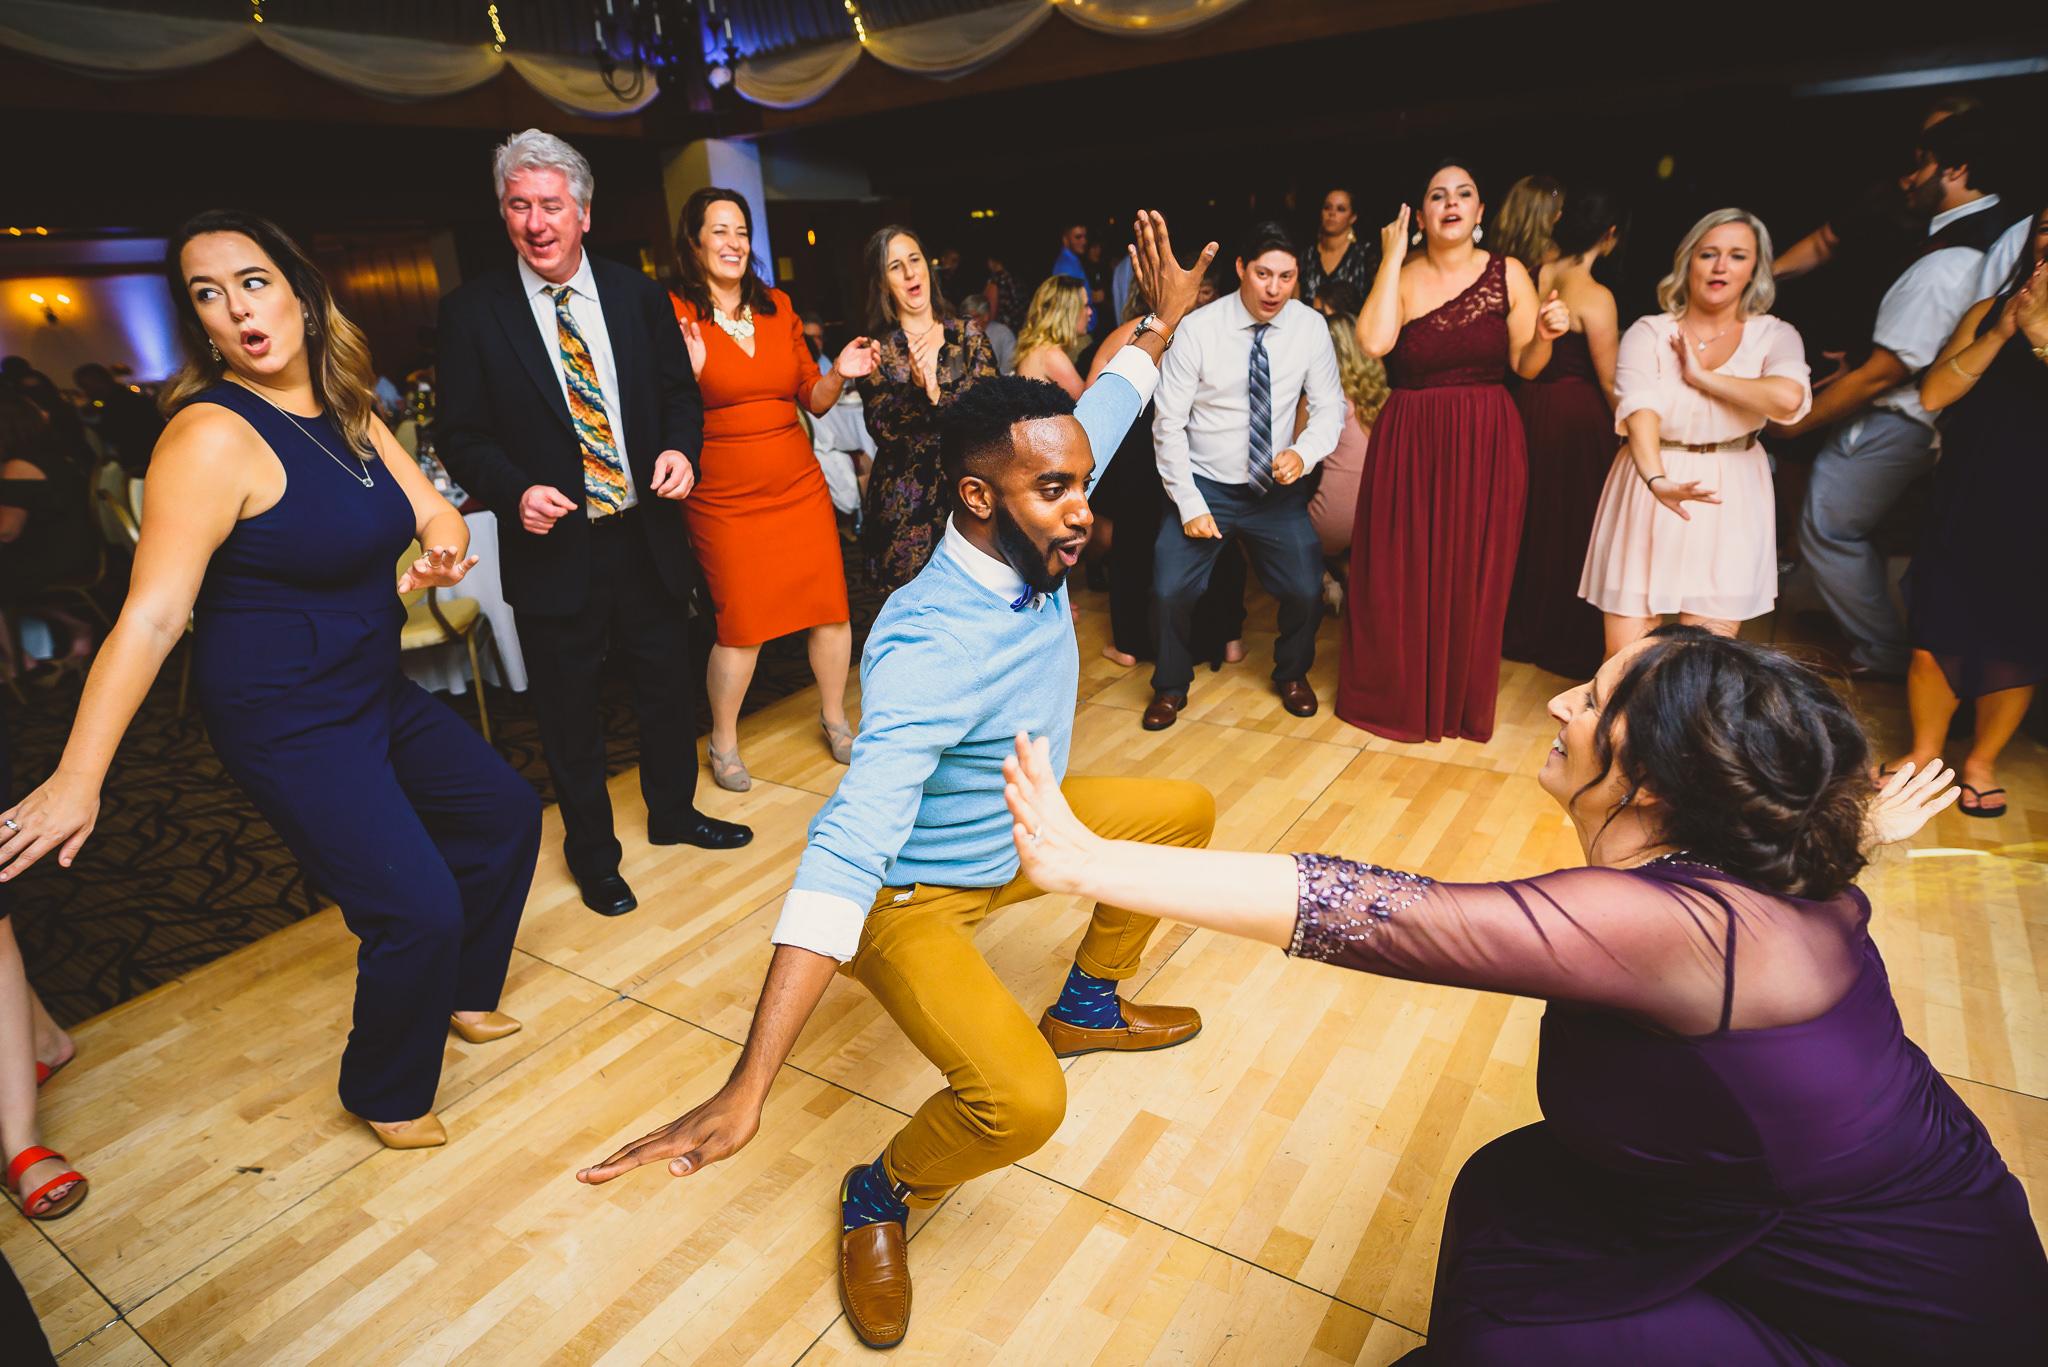 Wedding at Cedarbrook Country Club